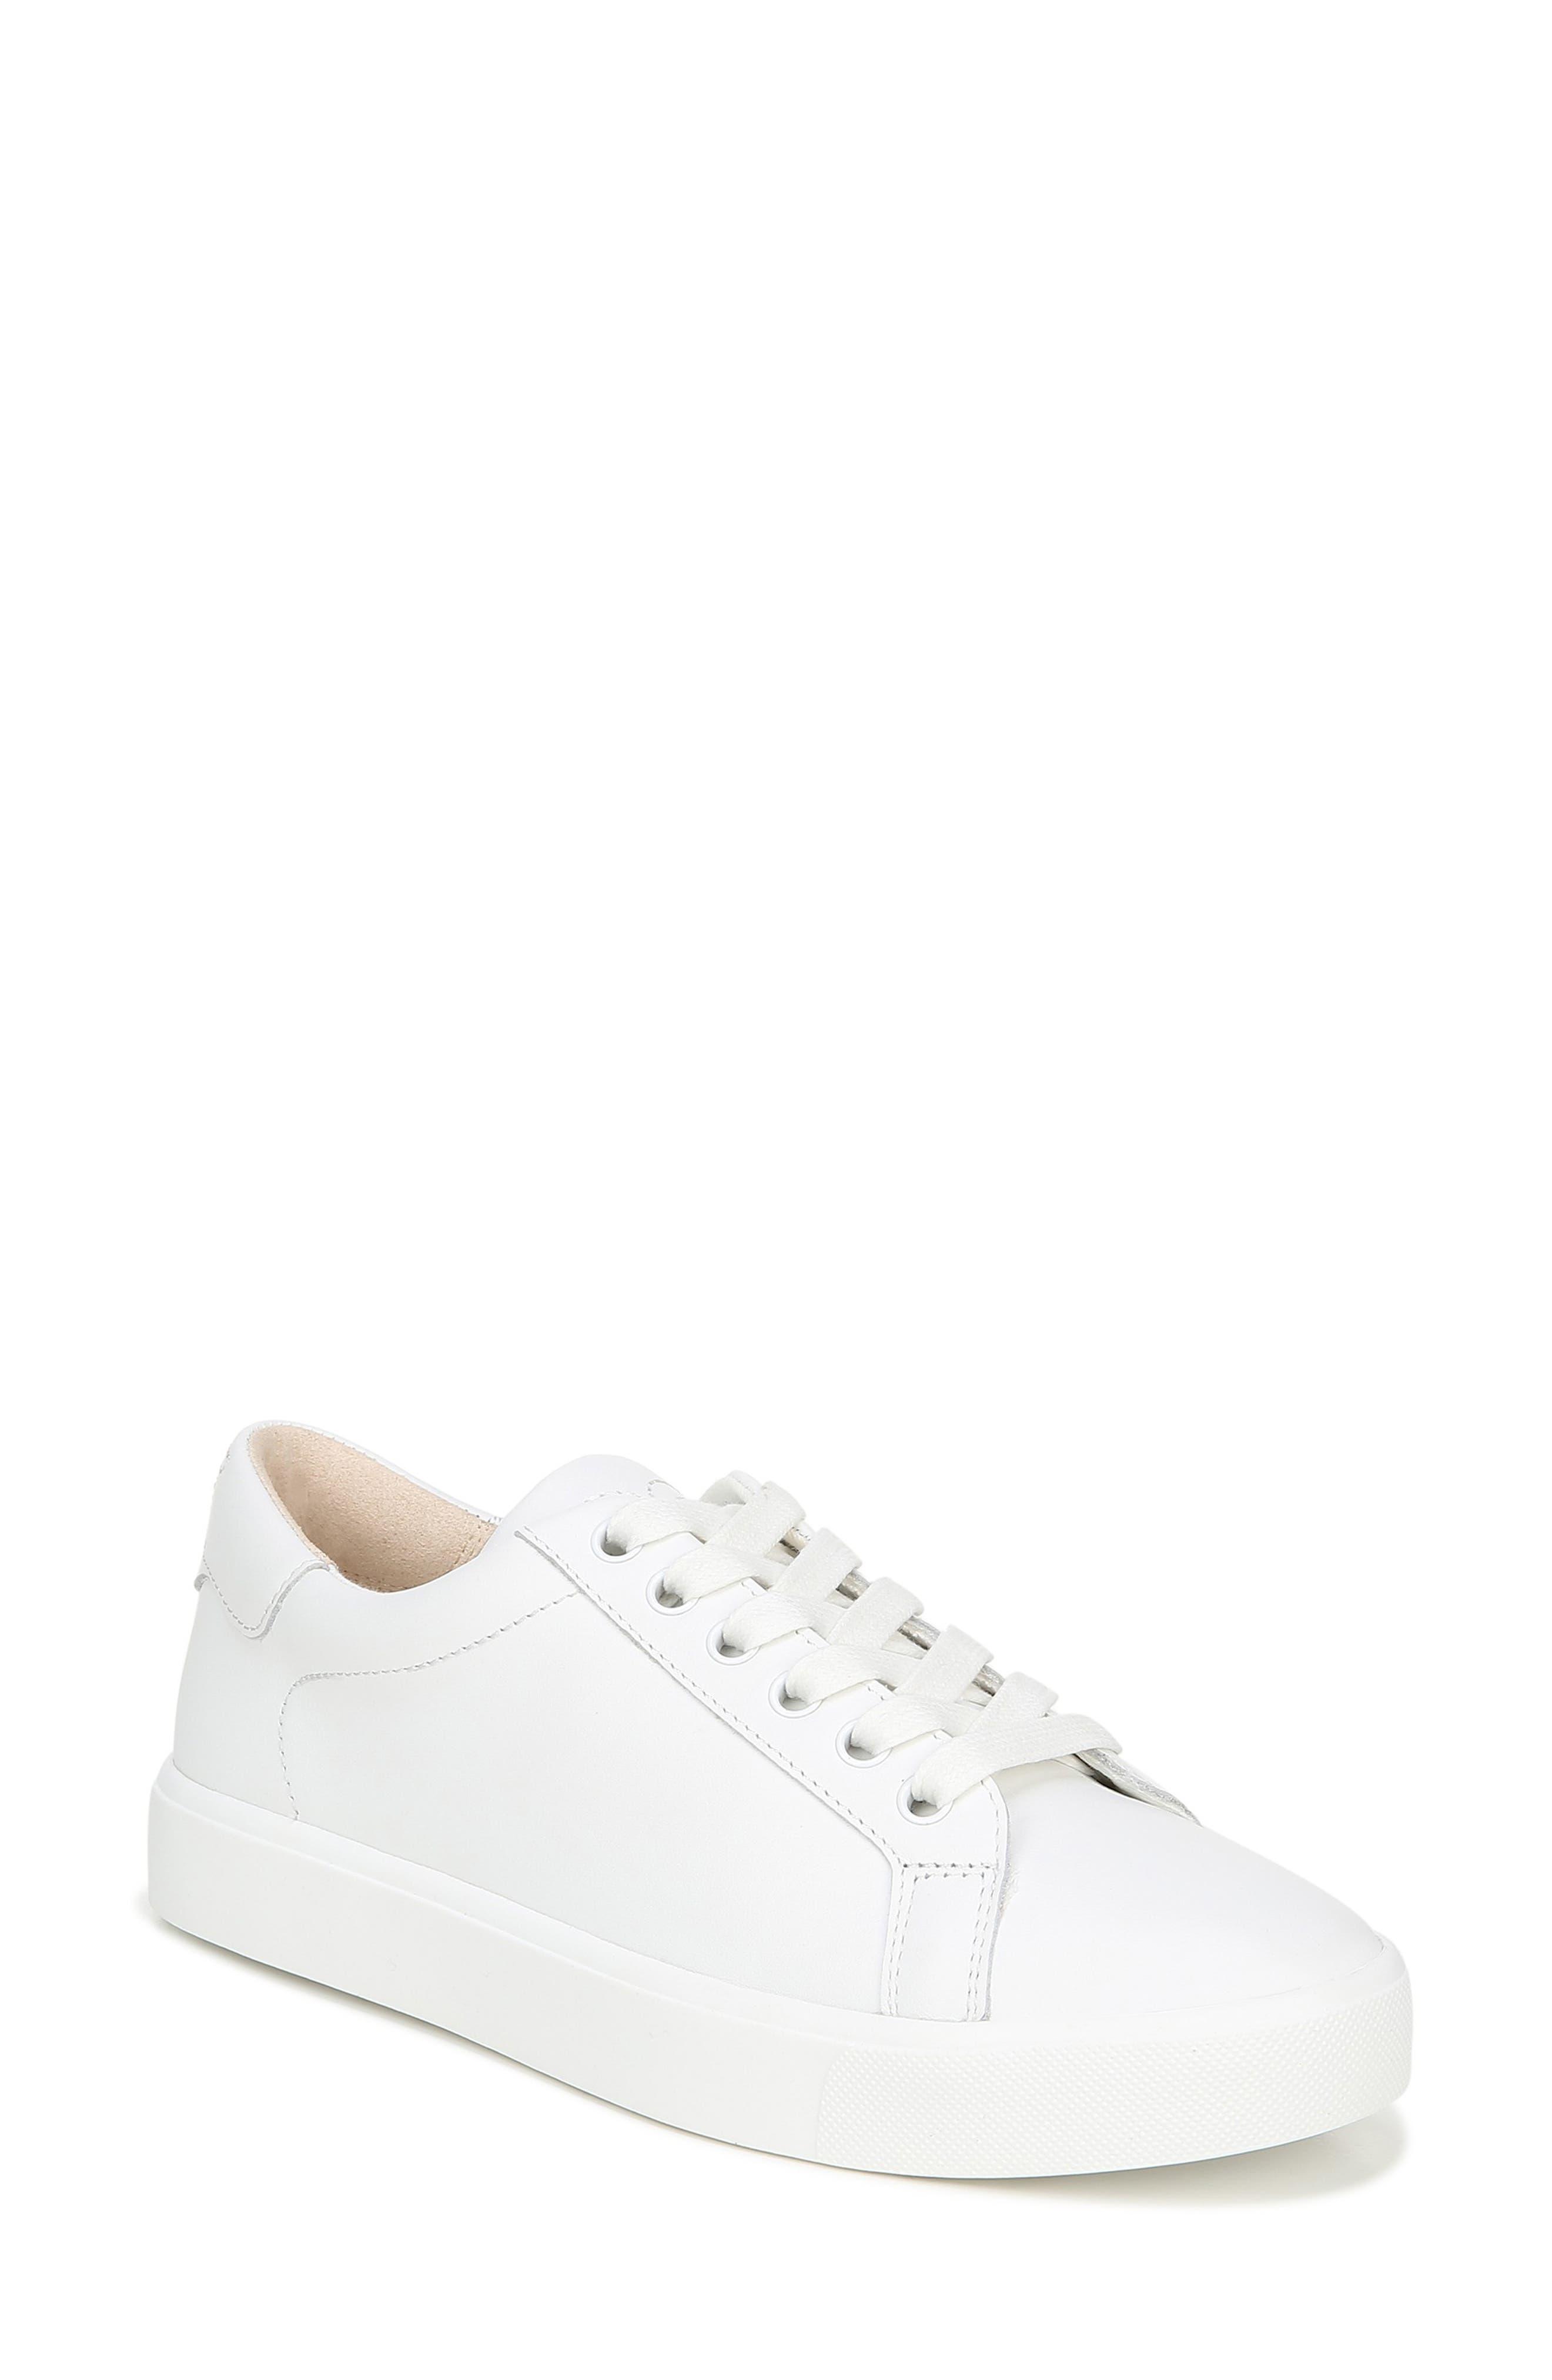 Sam Edelman Ethyl Low Top Sneaker